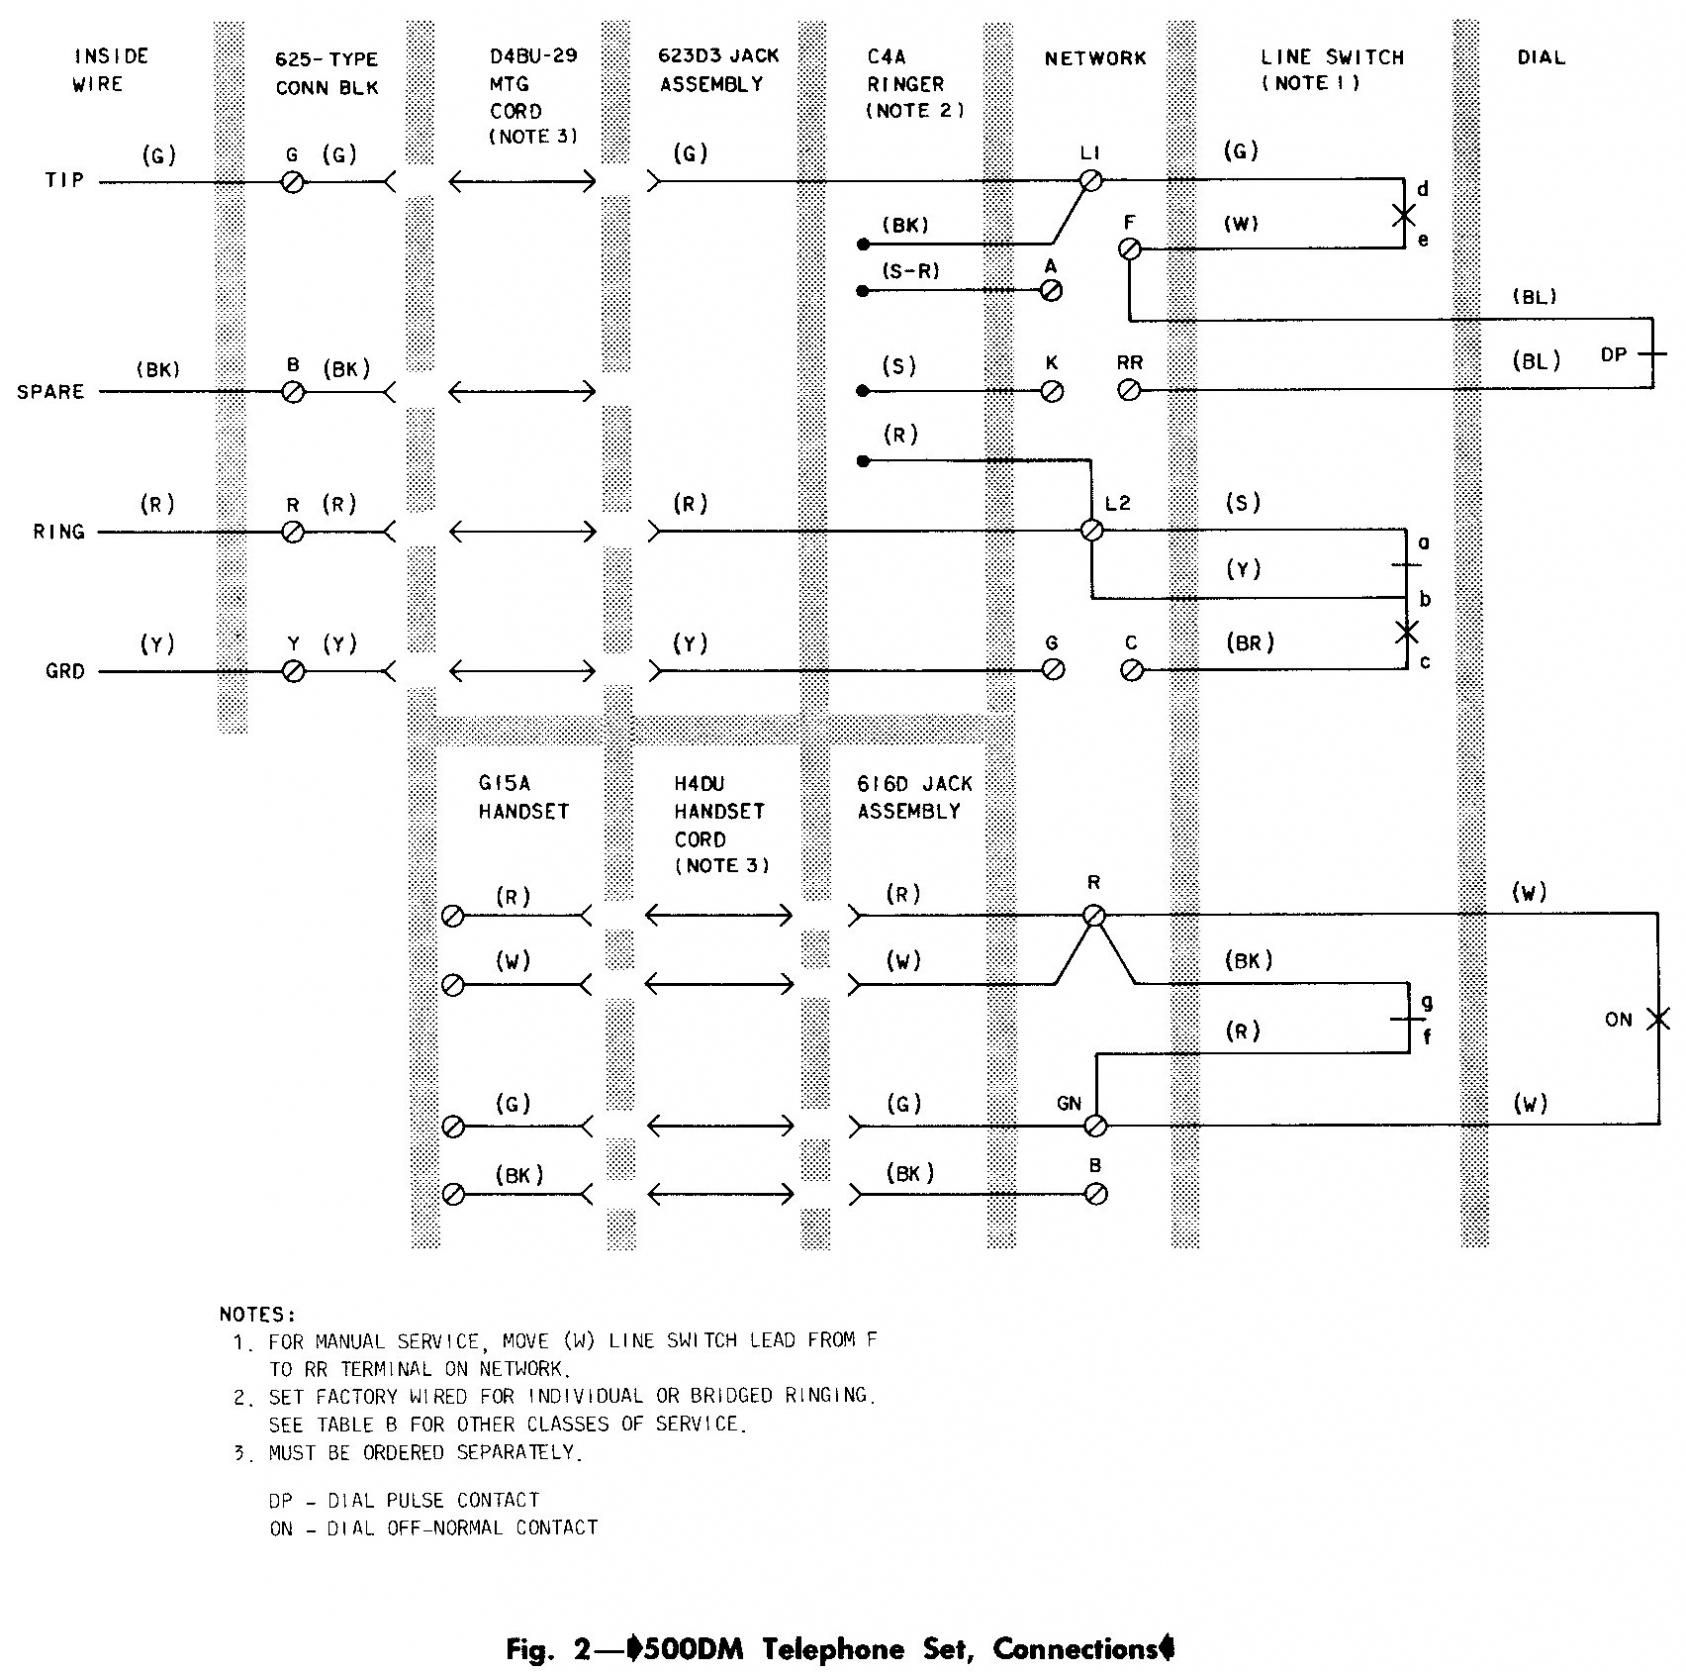 [DIAGRAM] Cat5e Wiring Diagram For Telephone FULL Version